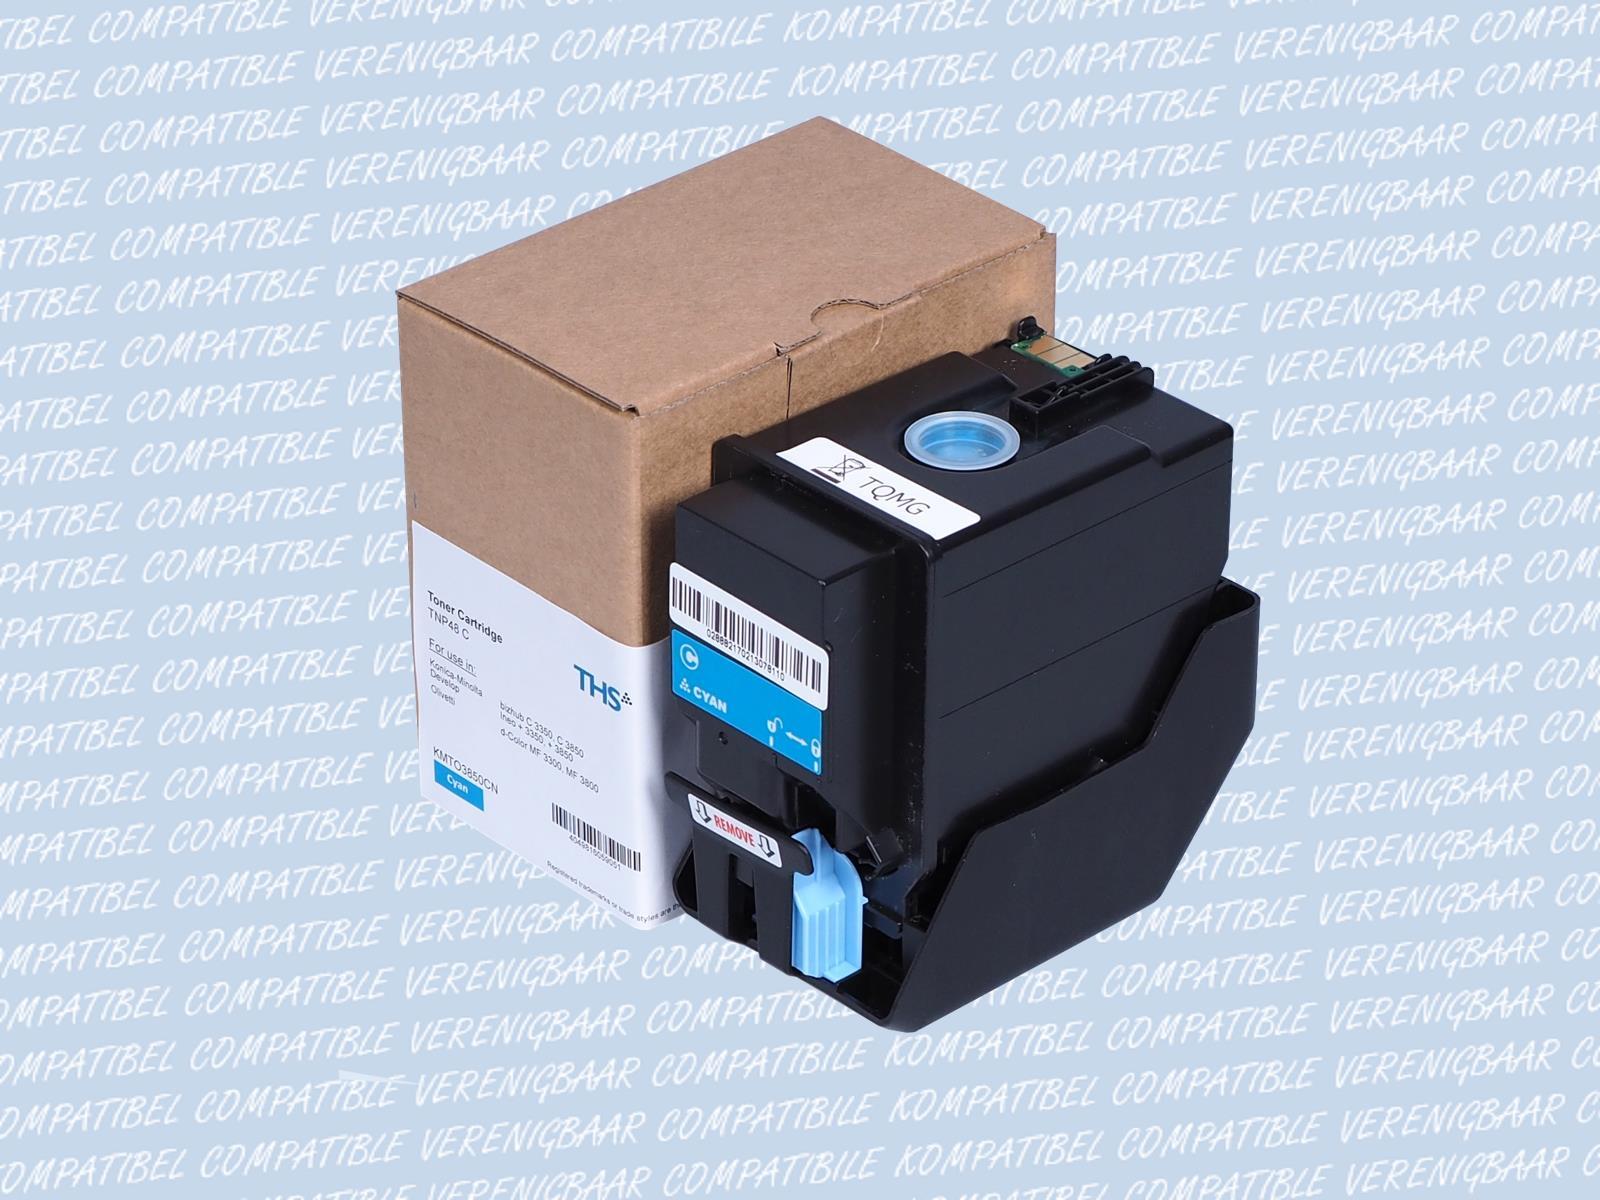 konica minolta c3350 printer driver